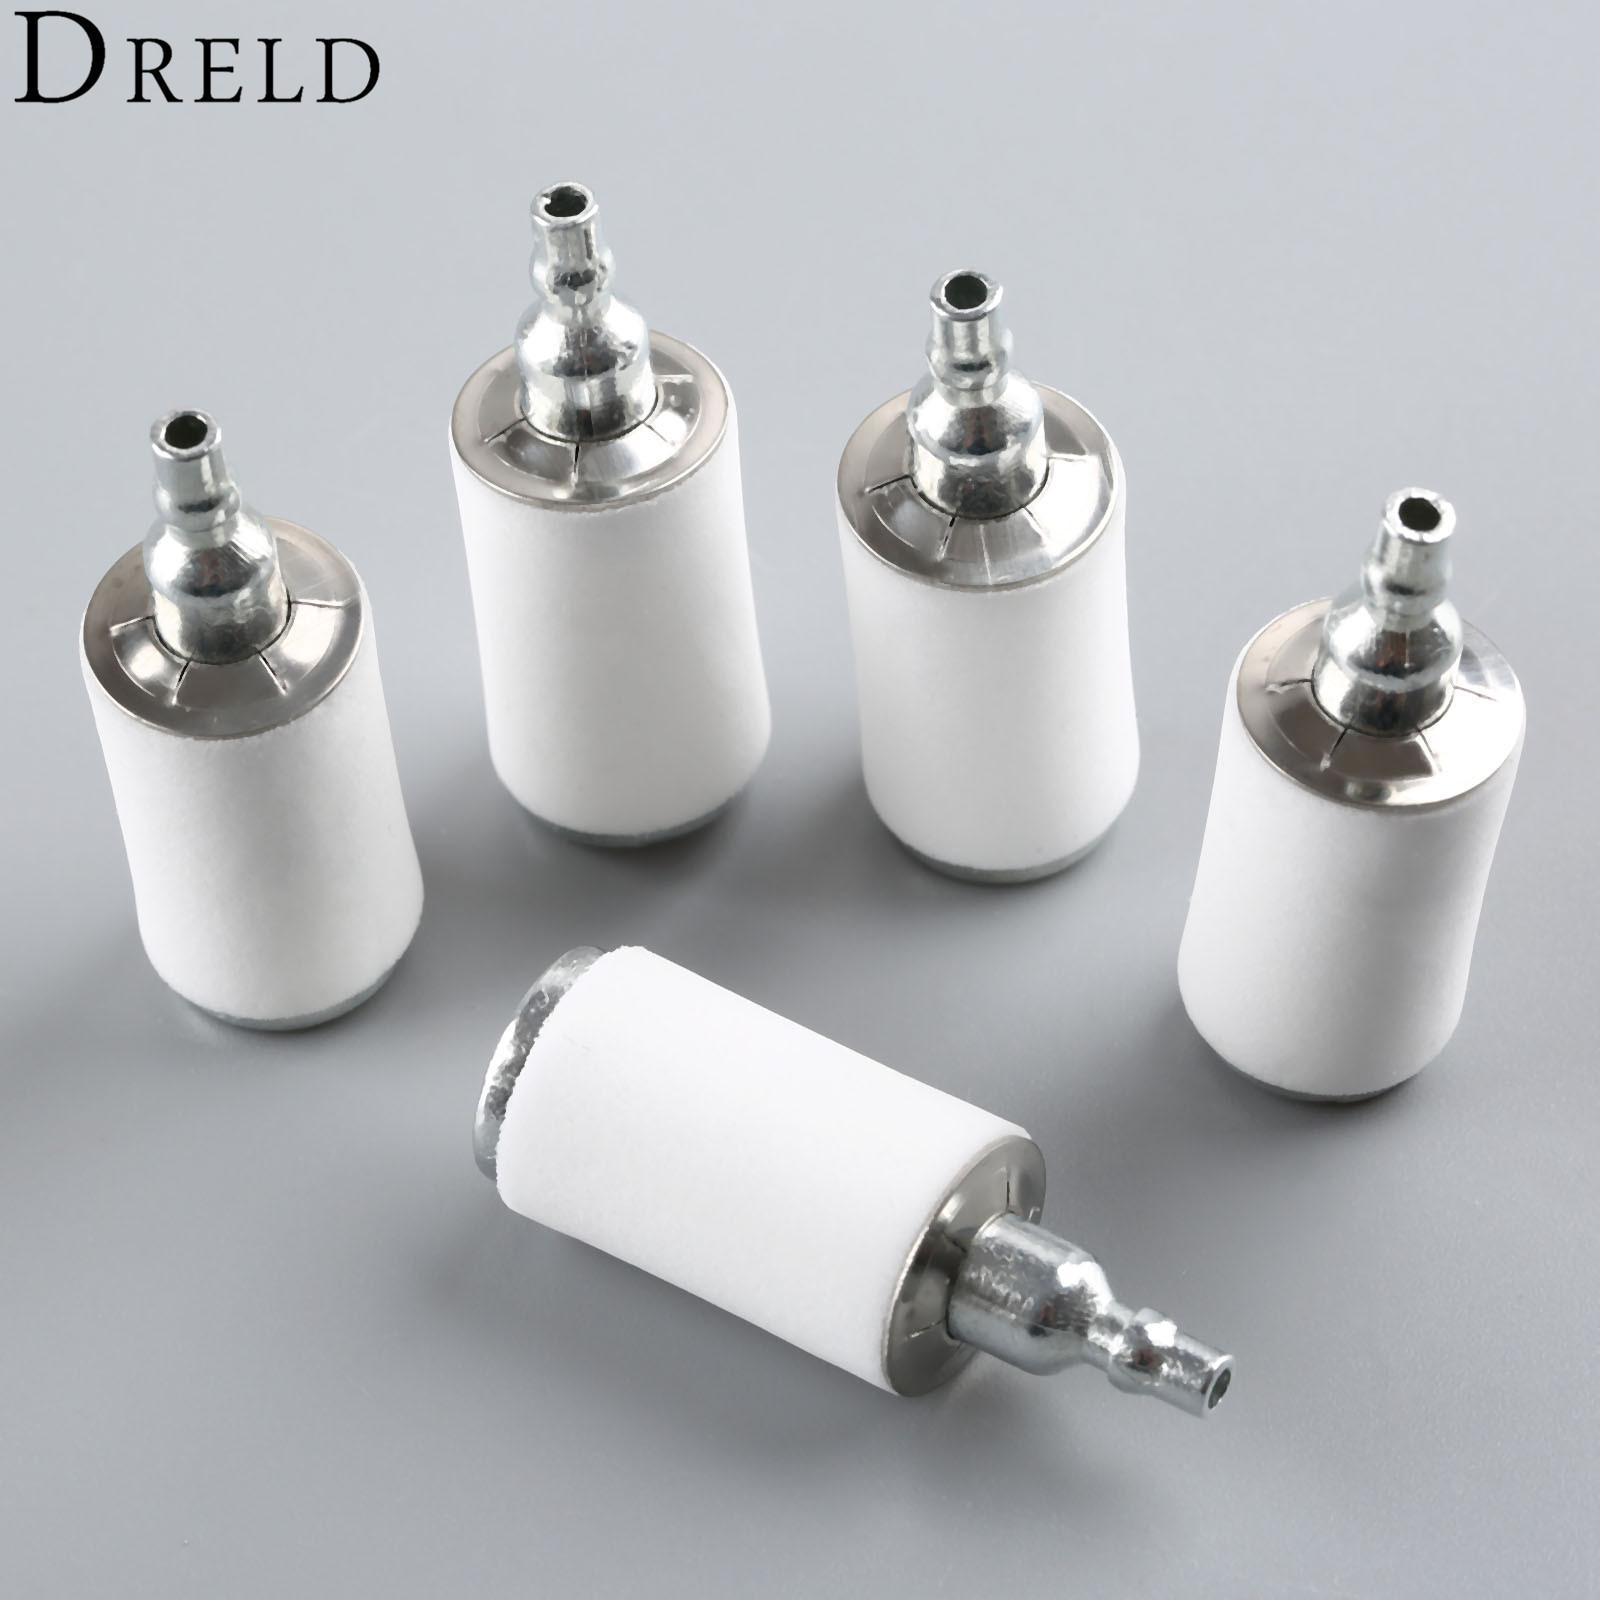 Poulan Blower Fuel Filter